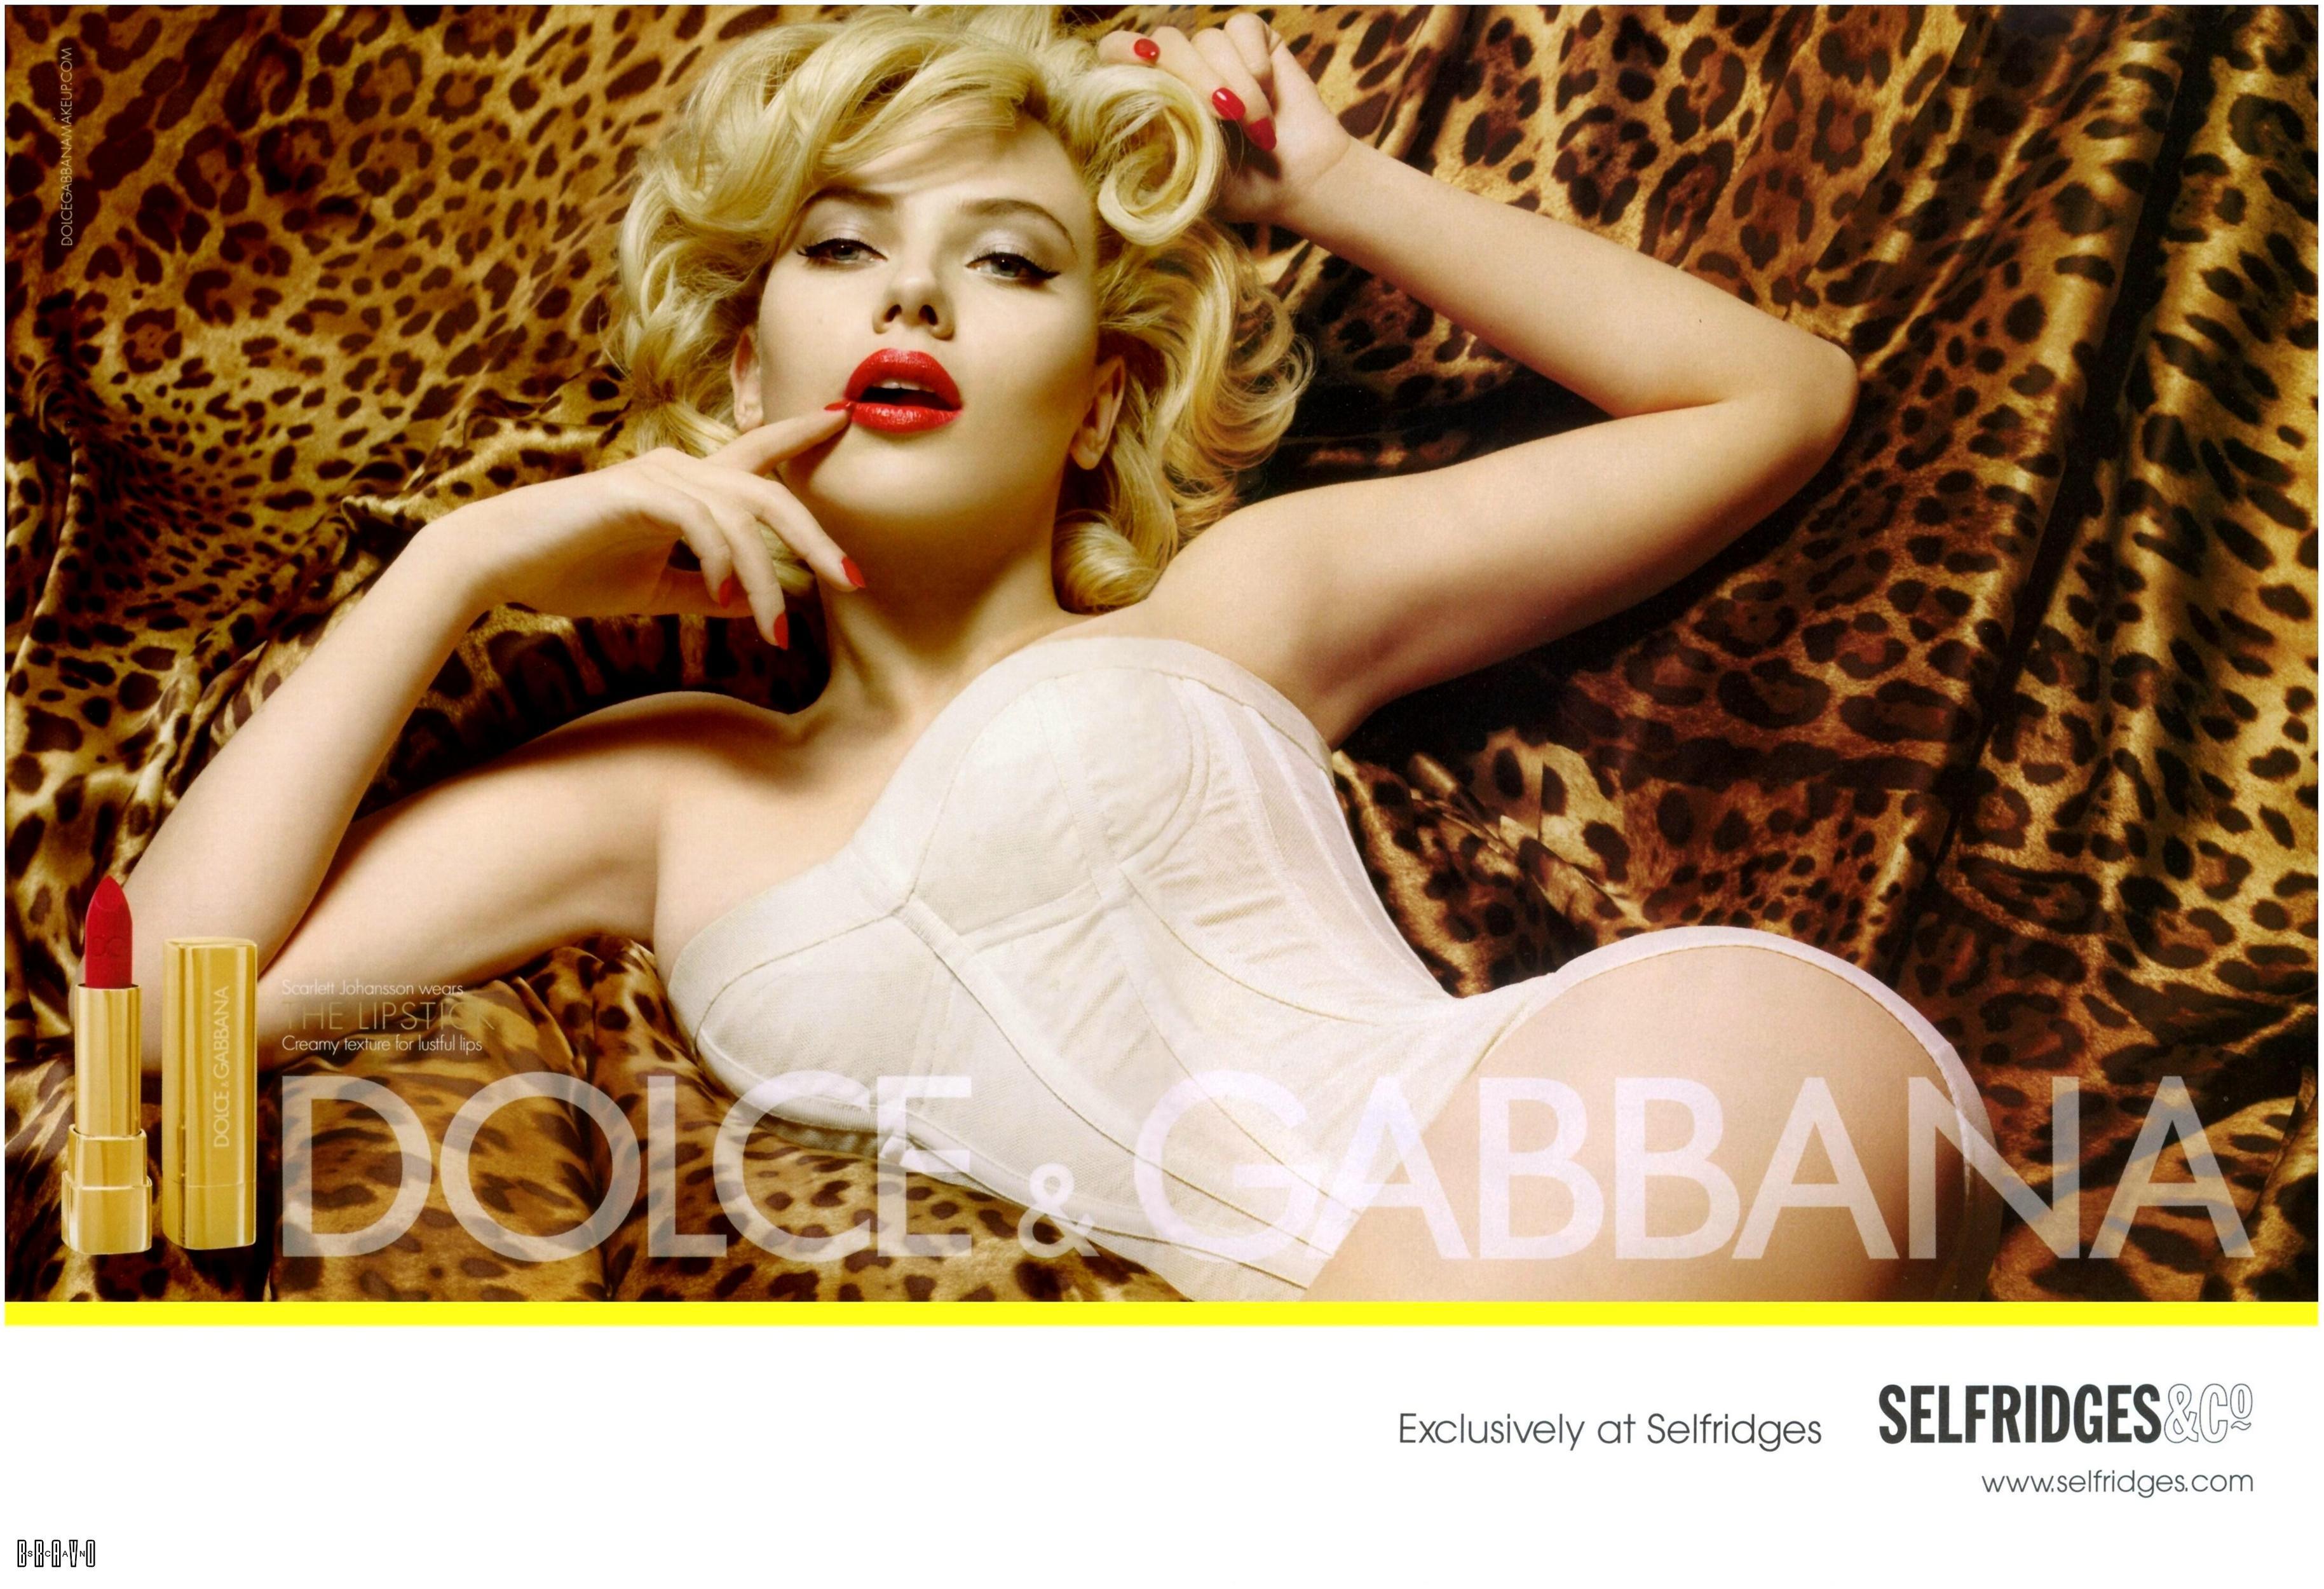 42082_Scarlett_Johansson_Dolce_and_Gabbana_Ad_1_122_505lo.jpg